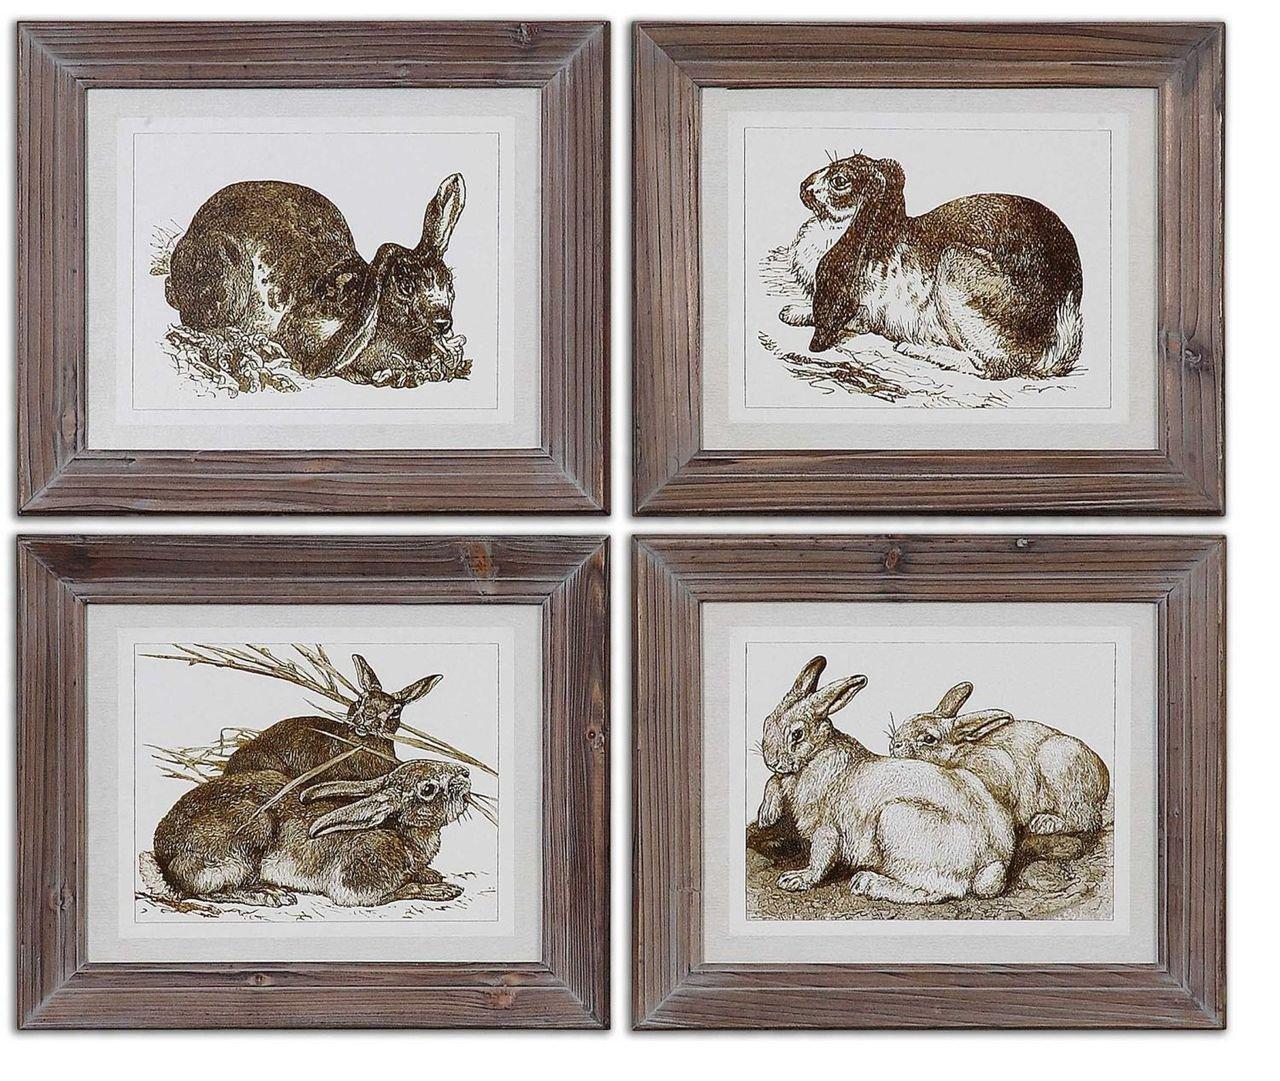 Sepia Rabbit Prints Wall Art   Vintage Style Gray Brown Bunny Artwork:  Amazon.co.uk: Kitchen & Home